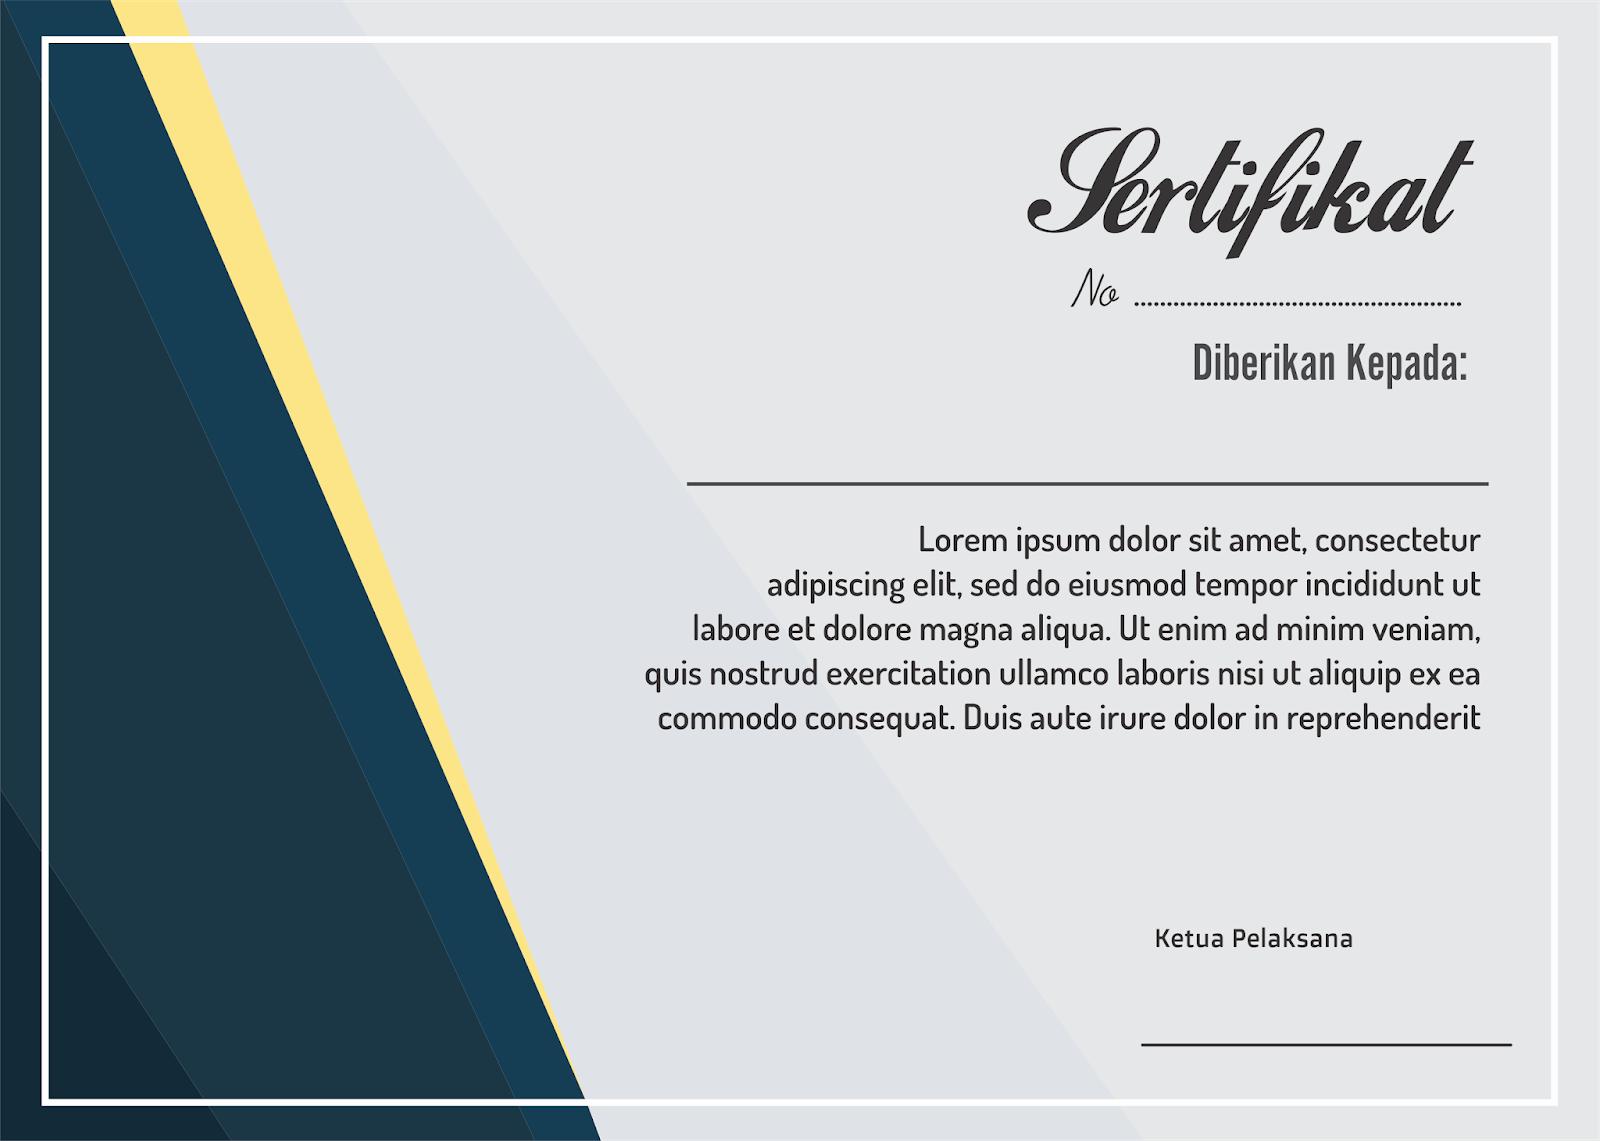 elegant simple template sertifikat cdr siap edit lembar bank clipart black & white bank clipart black & white